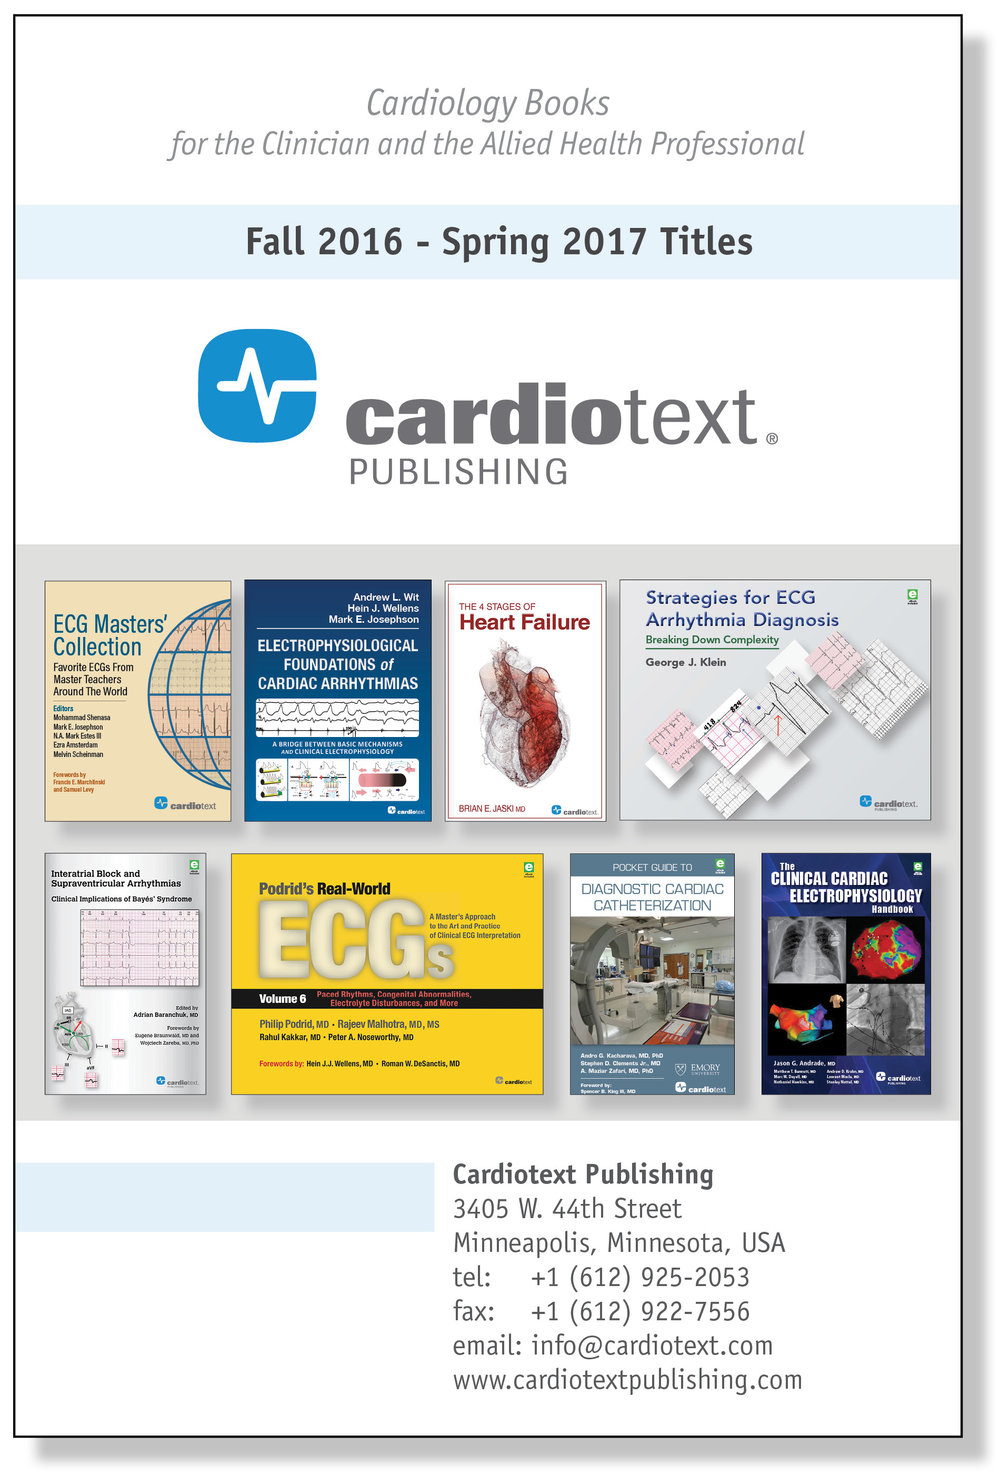 Cardiotext Publishing Fall/Winter 2016-2017 Catalog [PDF]